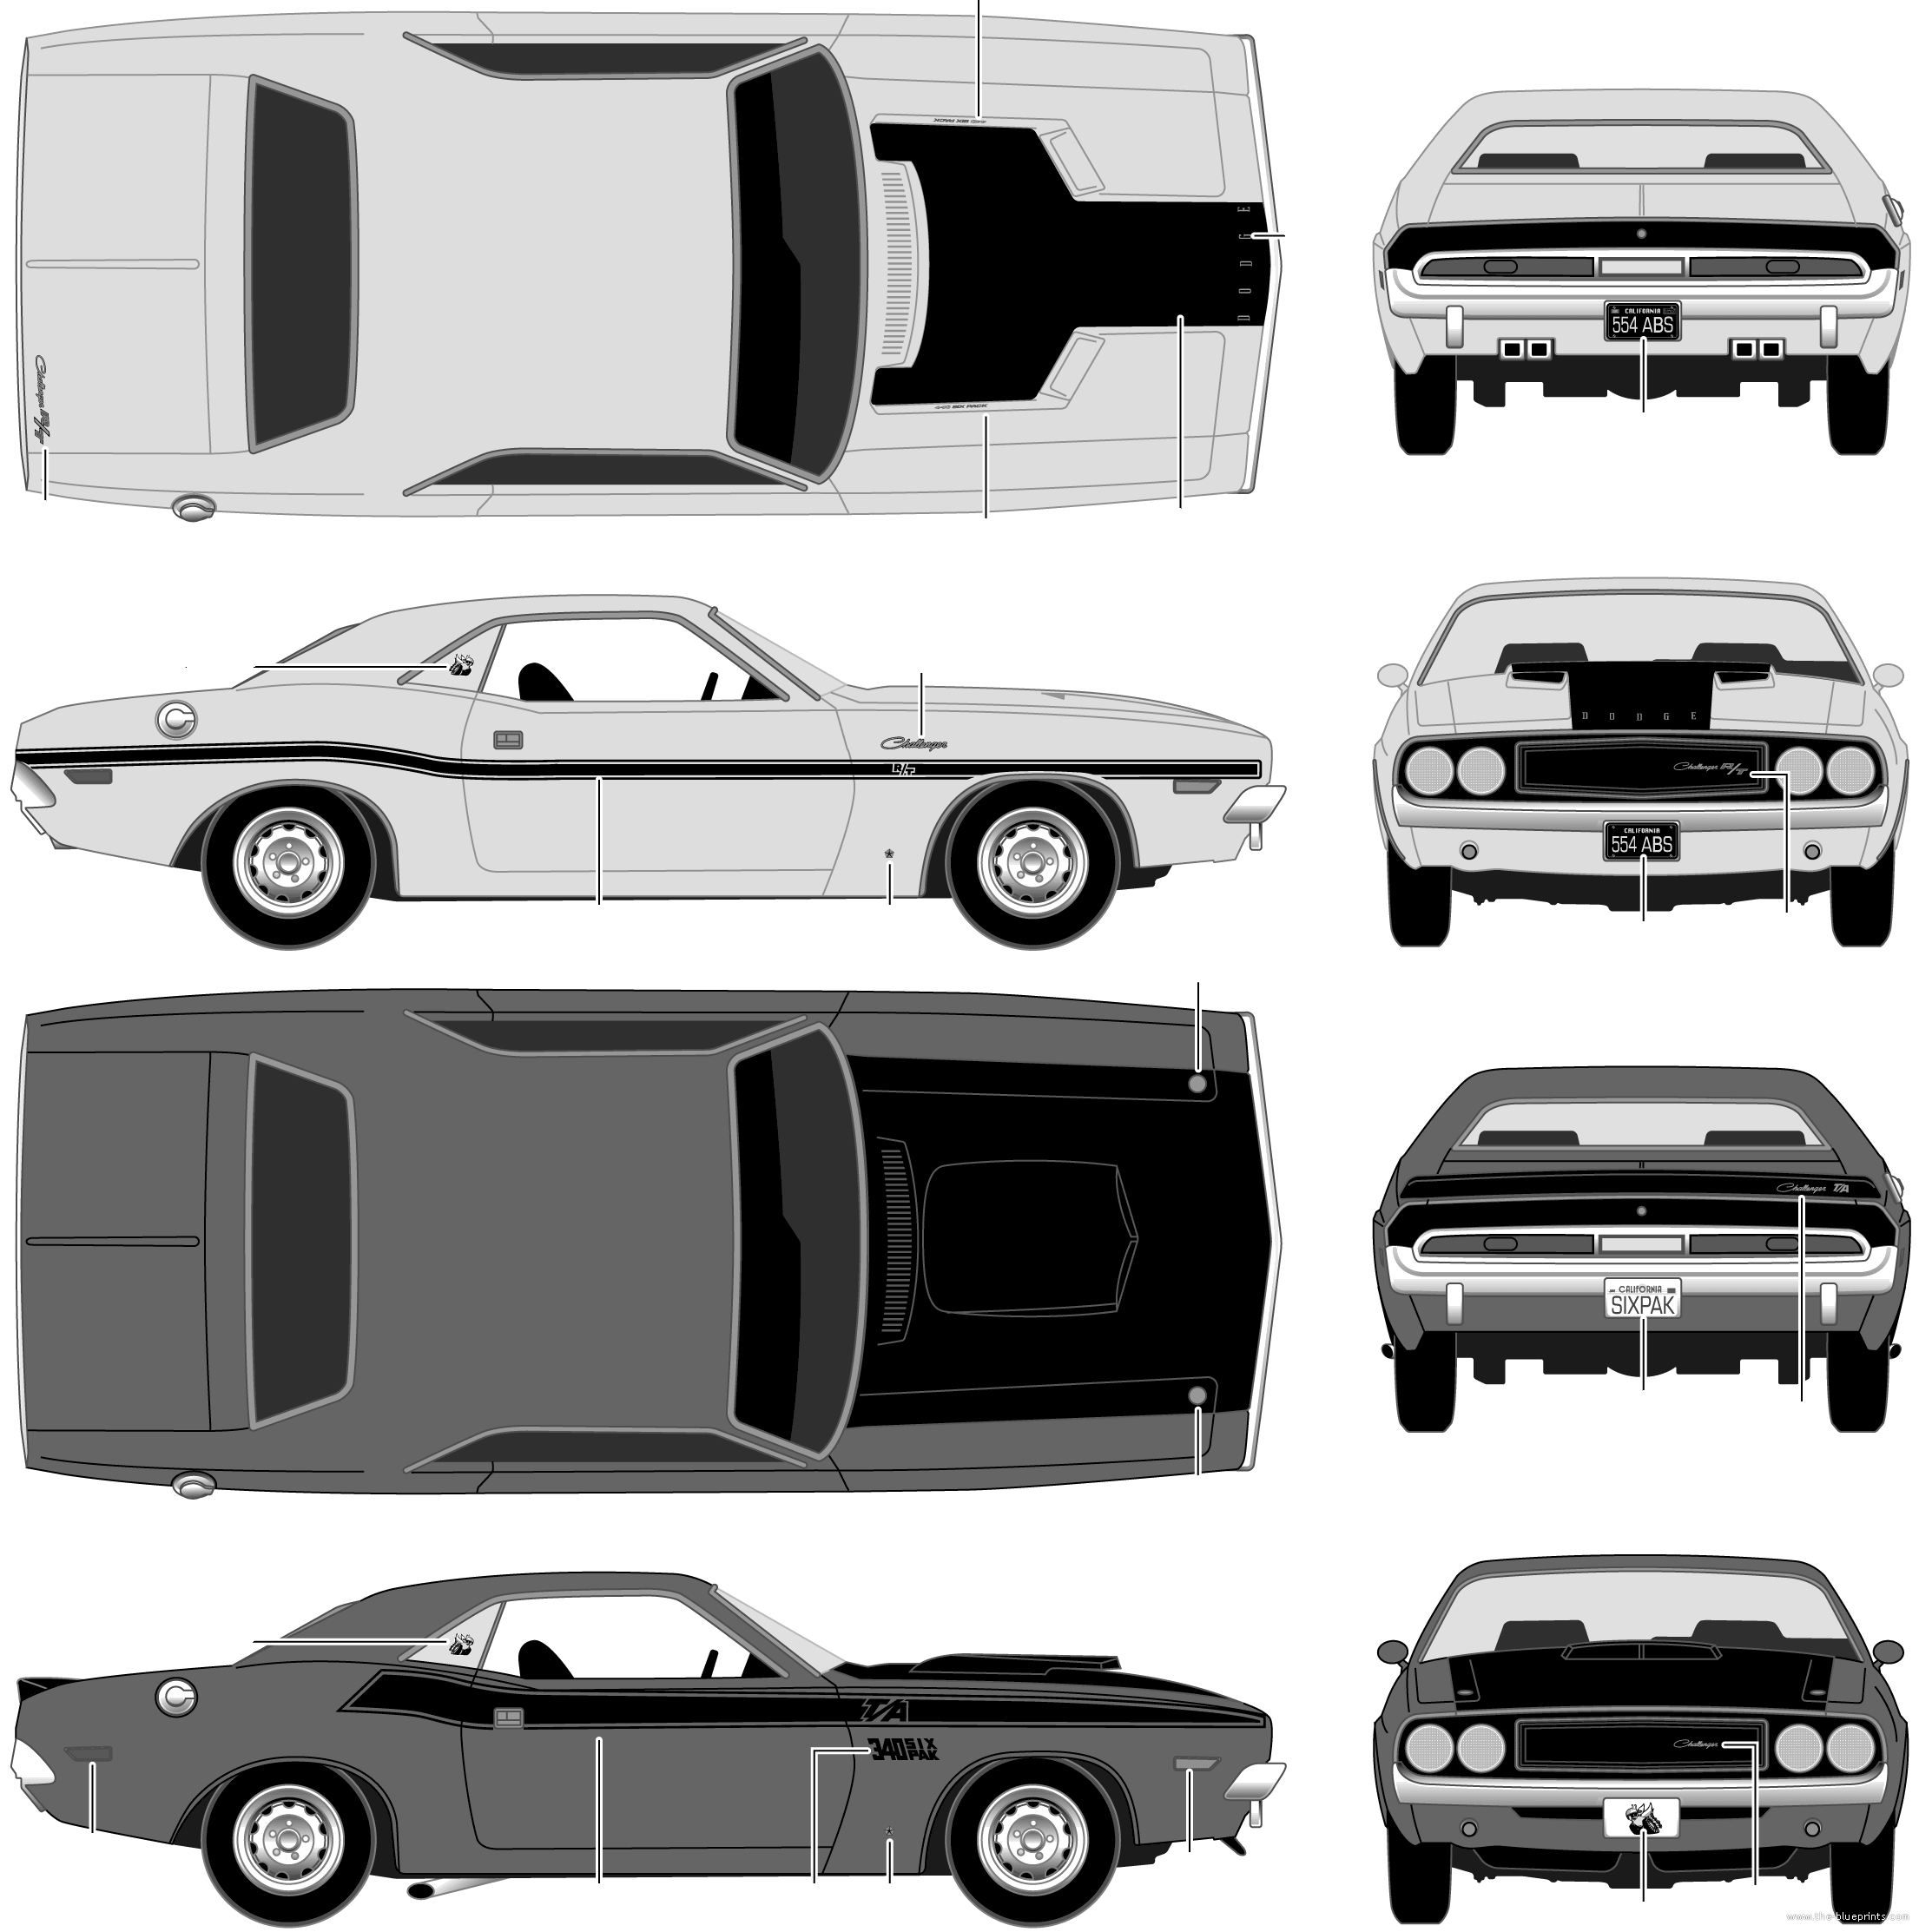 Dodge Challenger SRT8 clipart #18, Download drawings